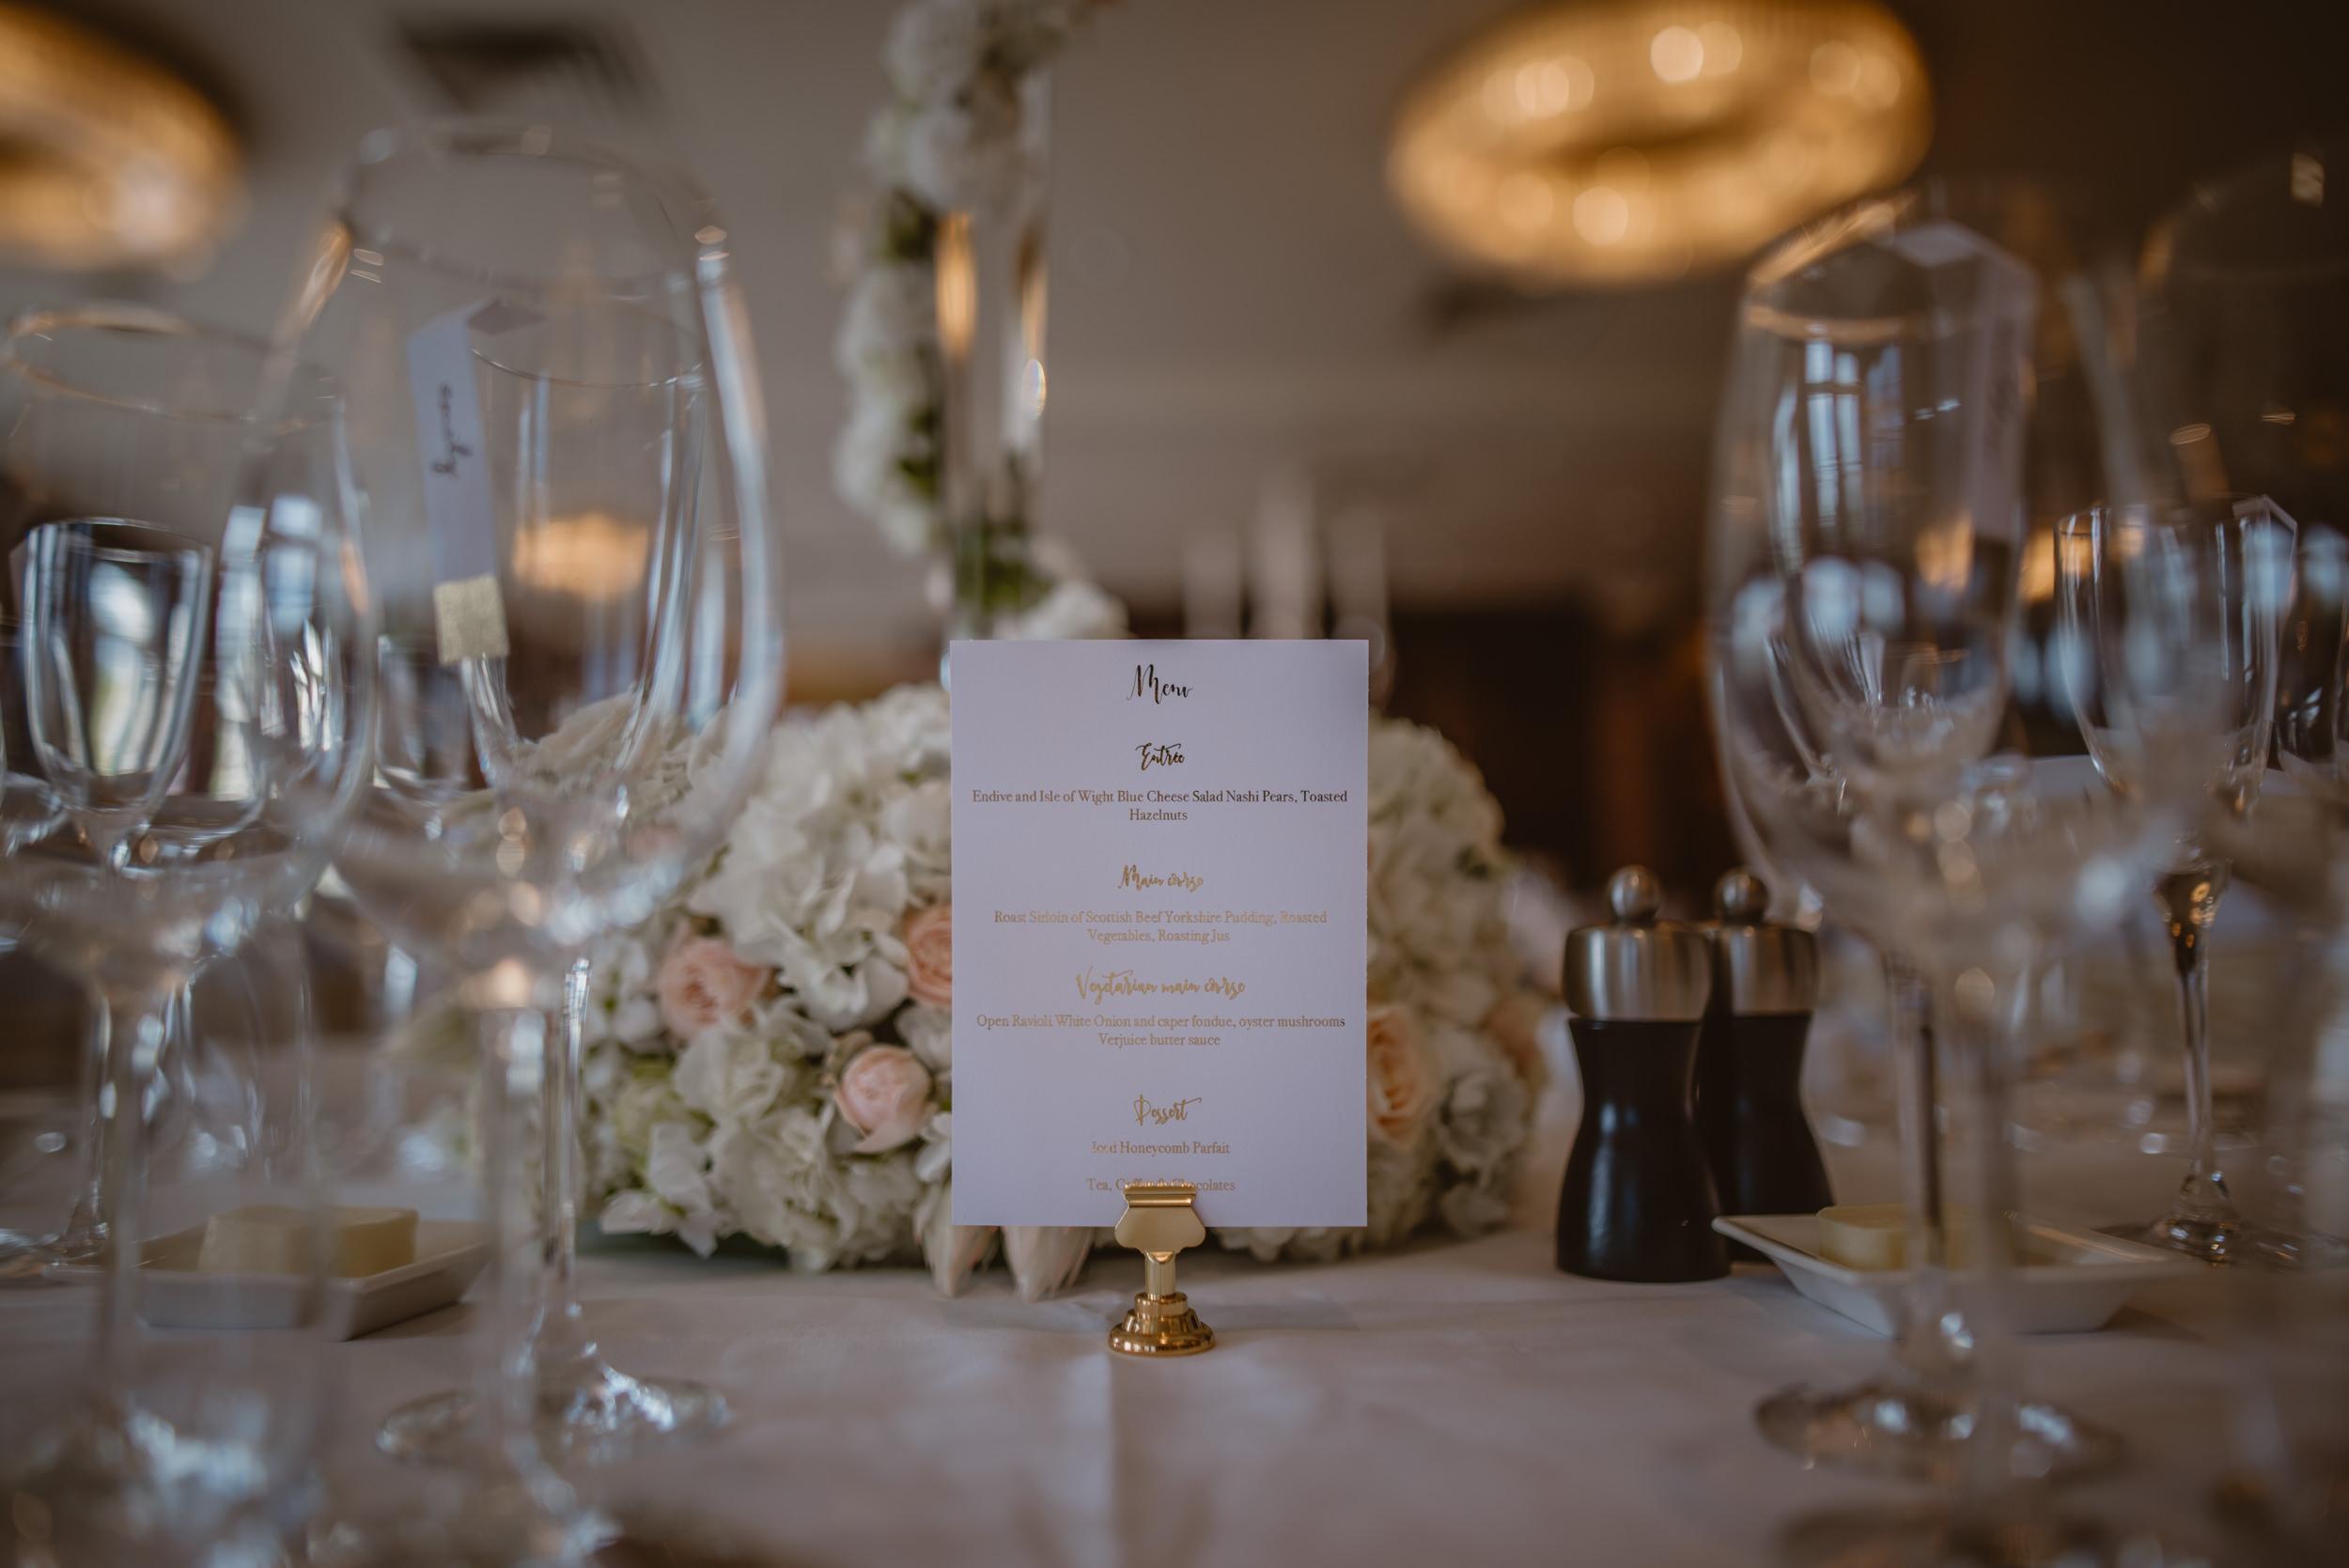 Trisha-and-Roger-wedding-The-Priory-Church-and-Chewton-Glen-Hotel-Christchurch-Manu-Mendoza-Wedding-Photography-268.jpg